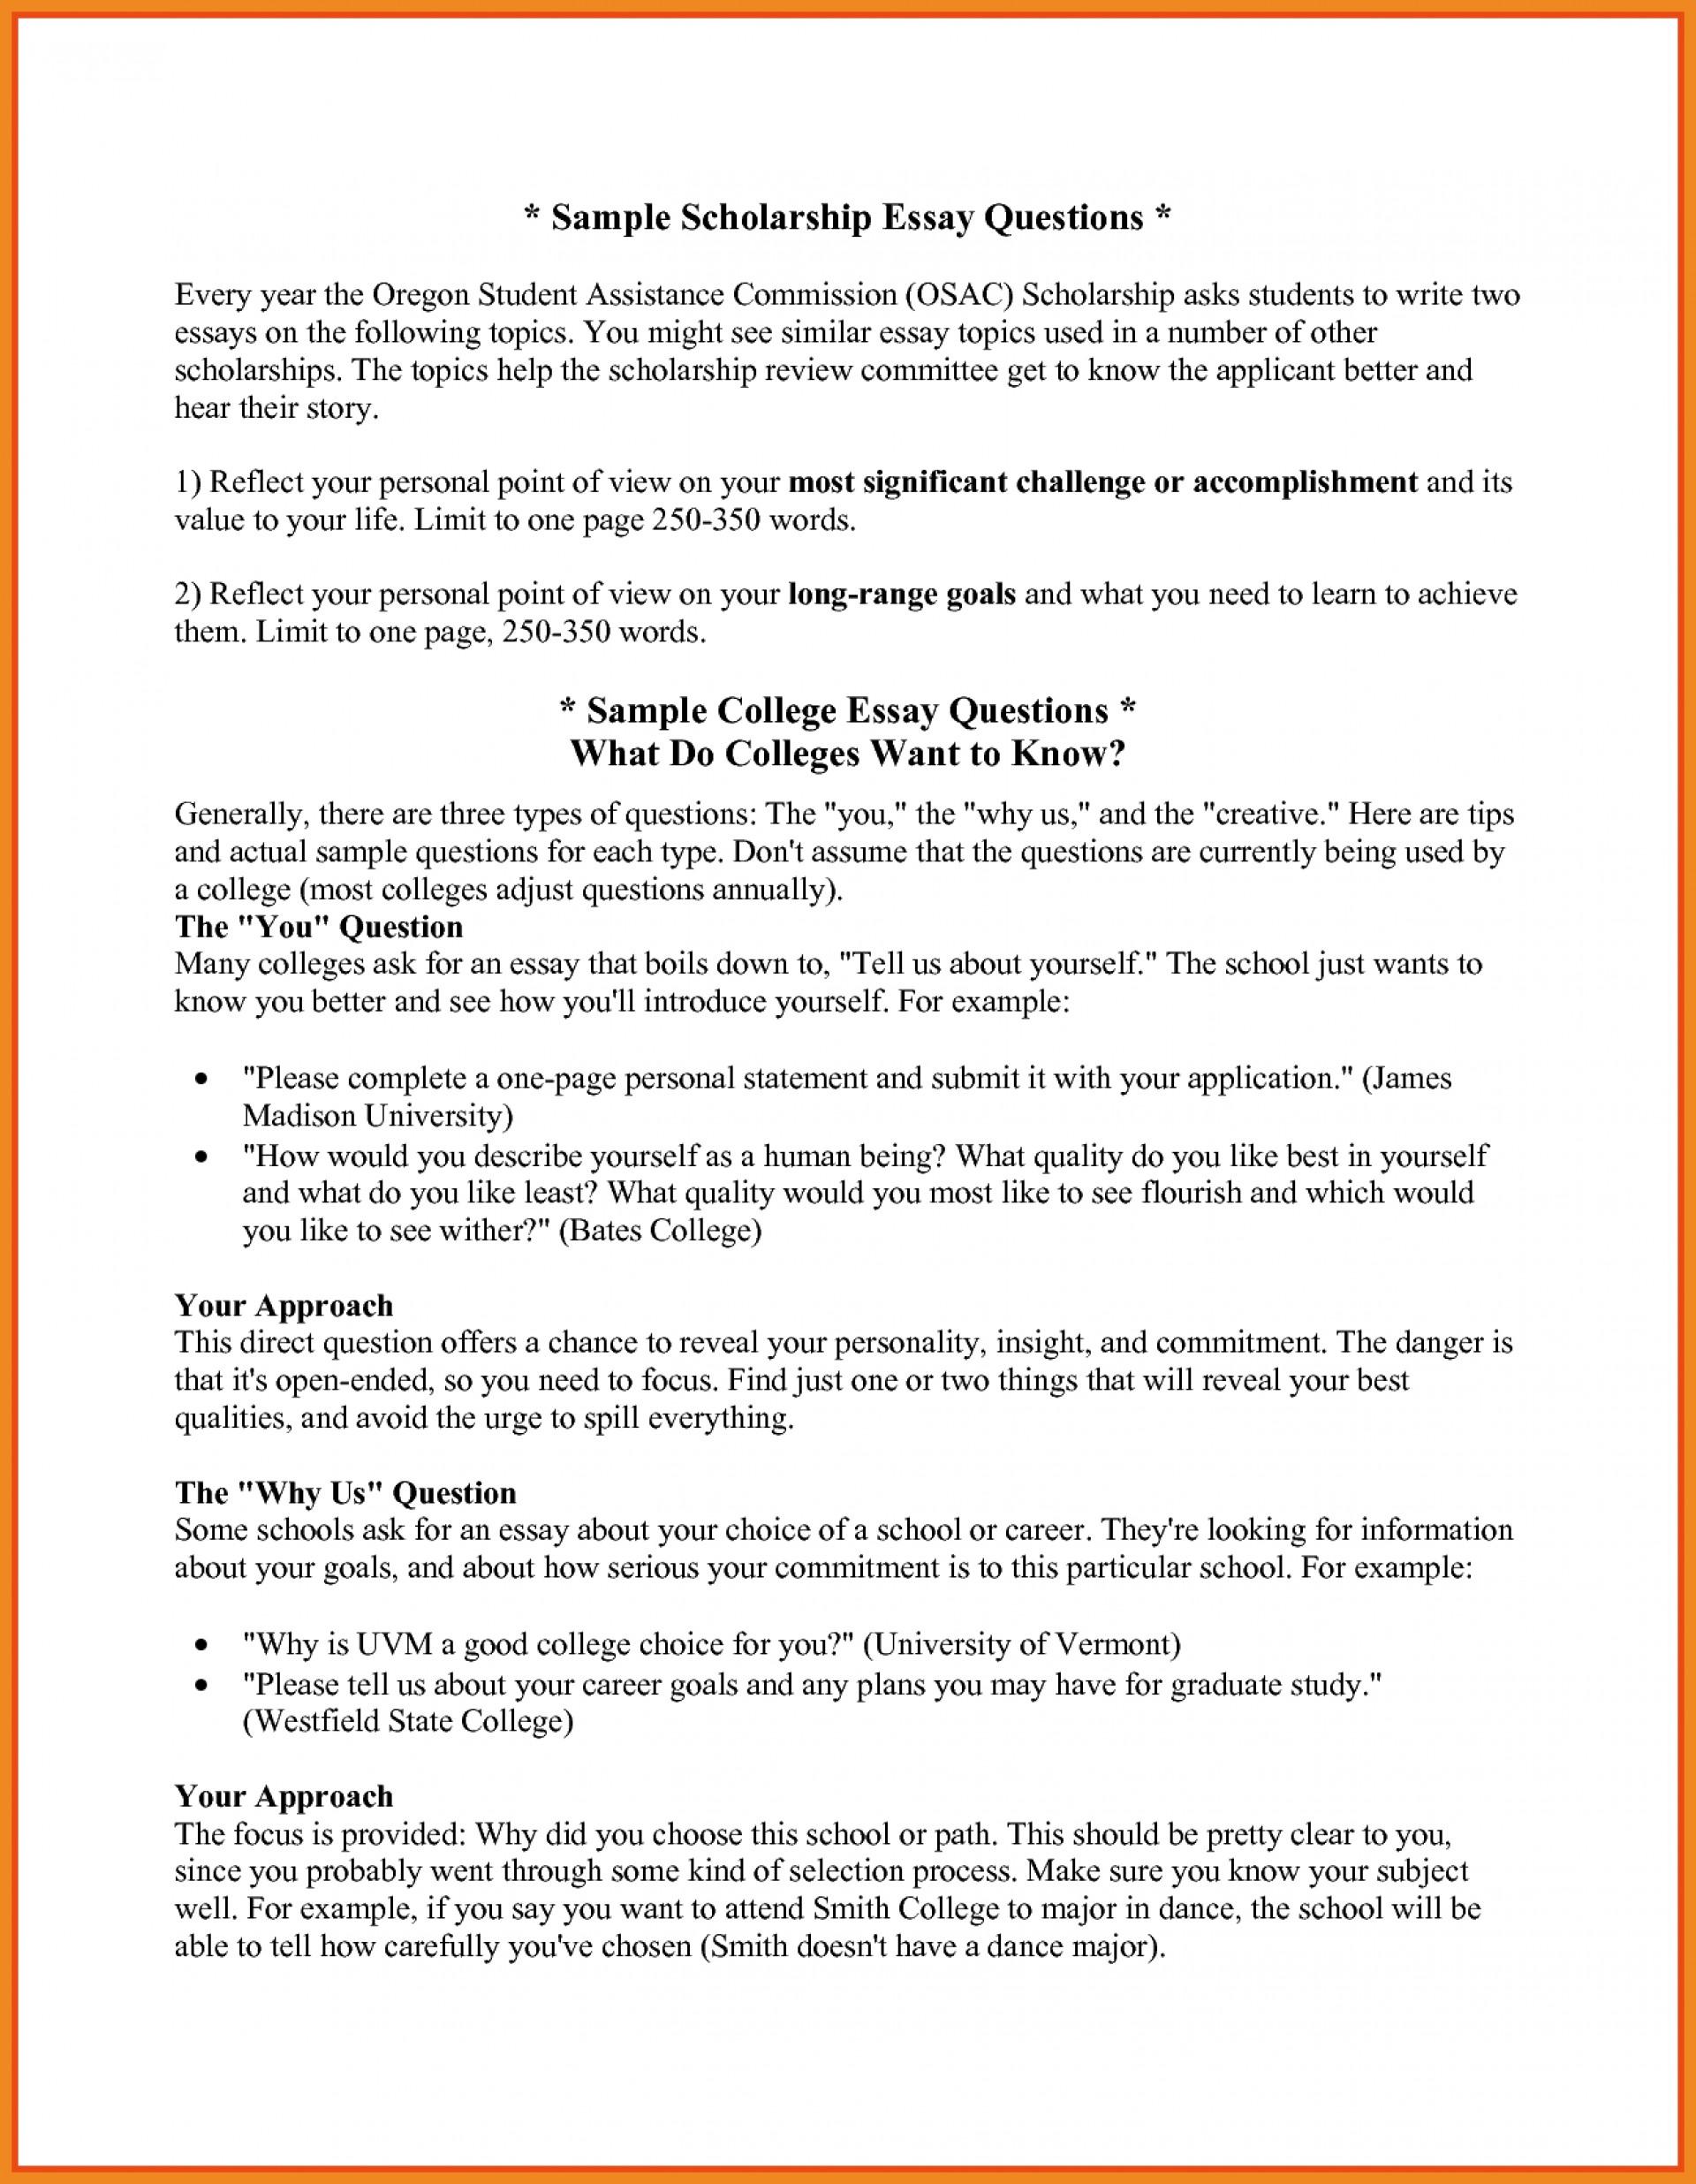 003 College Scholarship Essay Filename Fix Ablez How Will Help Achieve Your Goa Goals Best Topics List Template Tips 1920